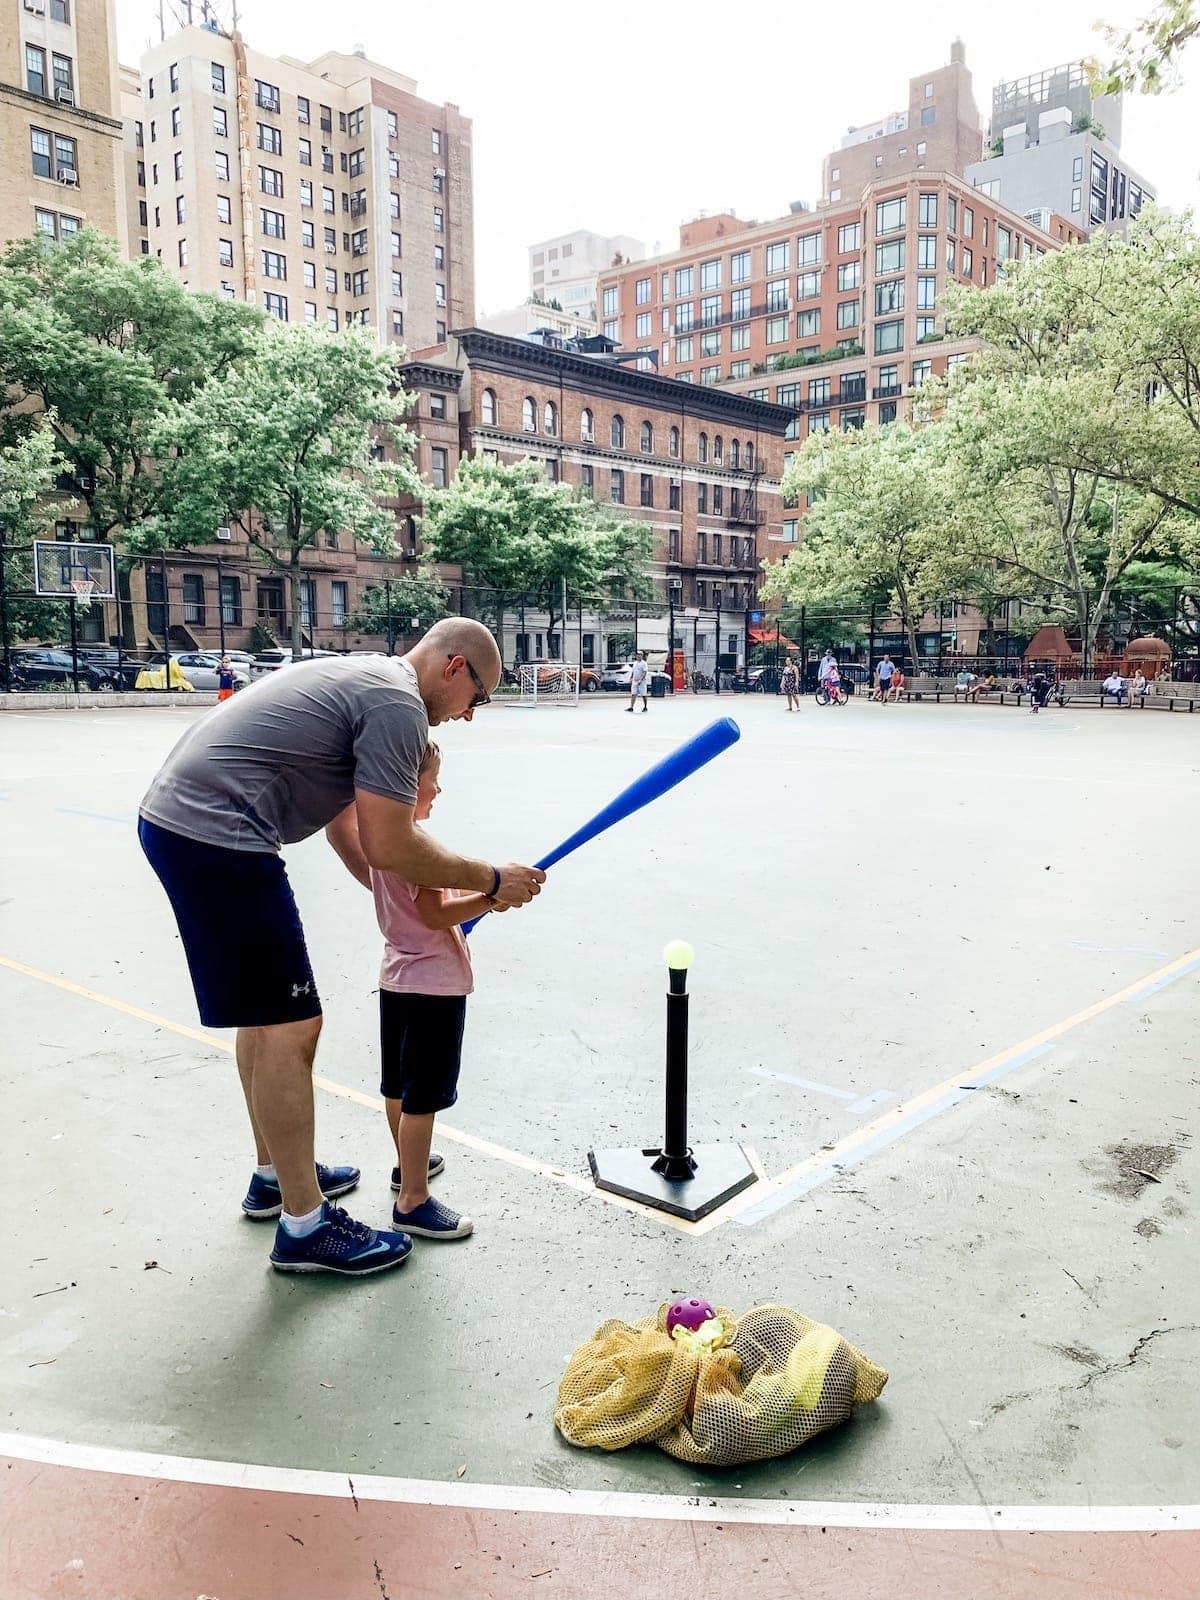 Gordon helping blake with T-ball